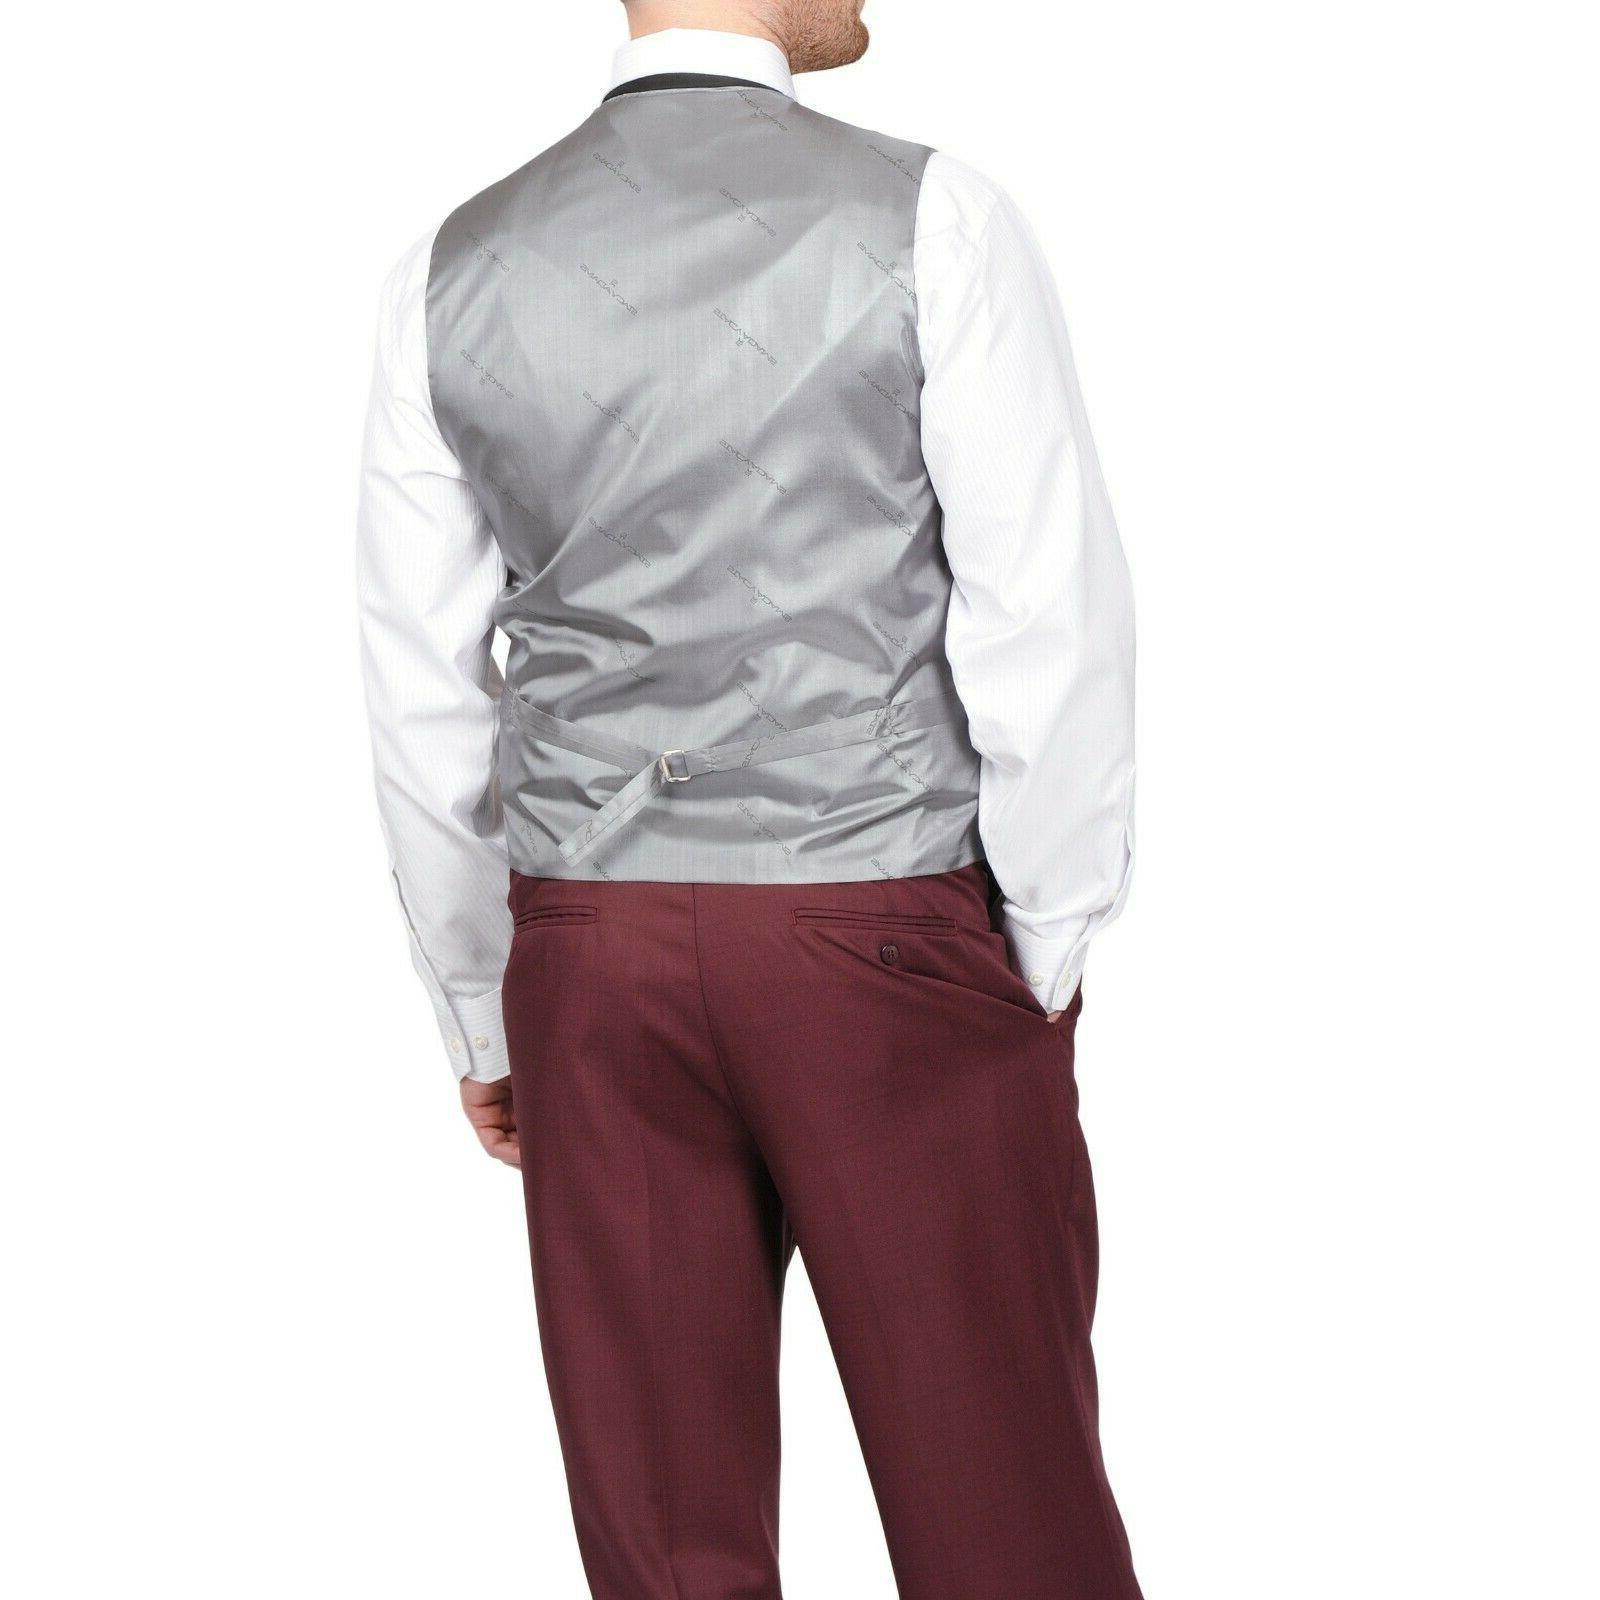 Brand Burgundy Piece Suit Coat- 29R